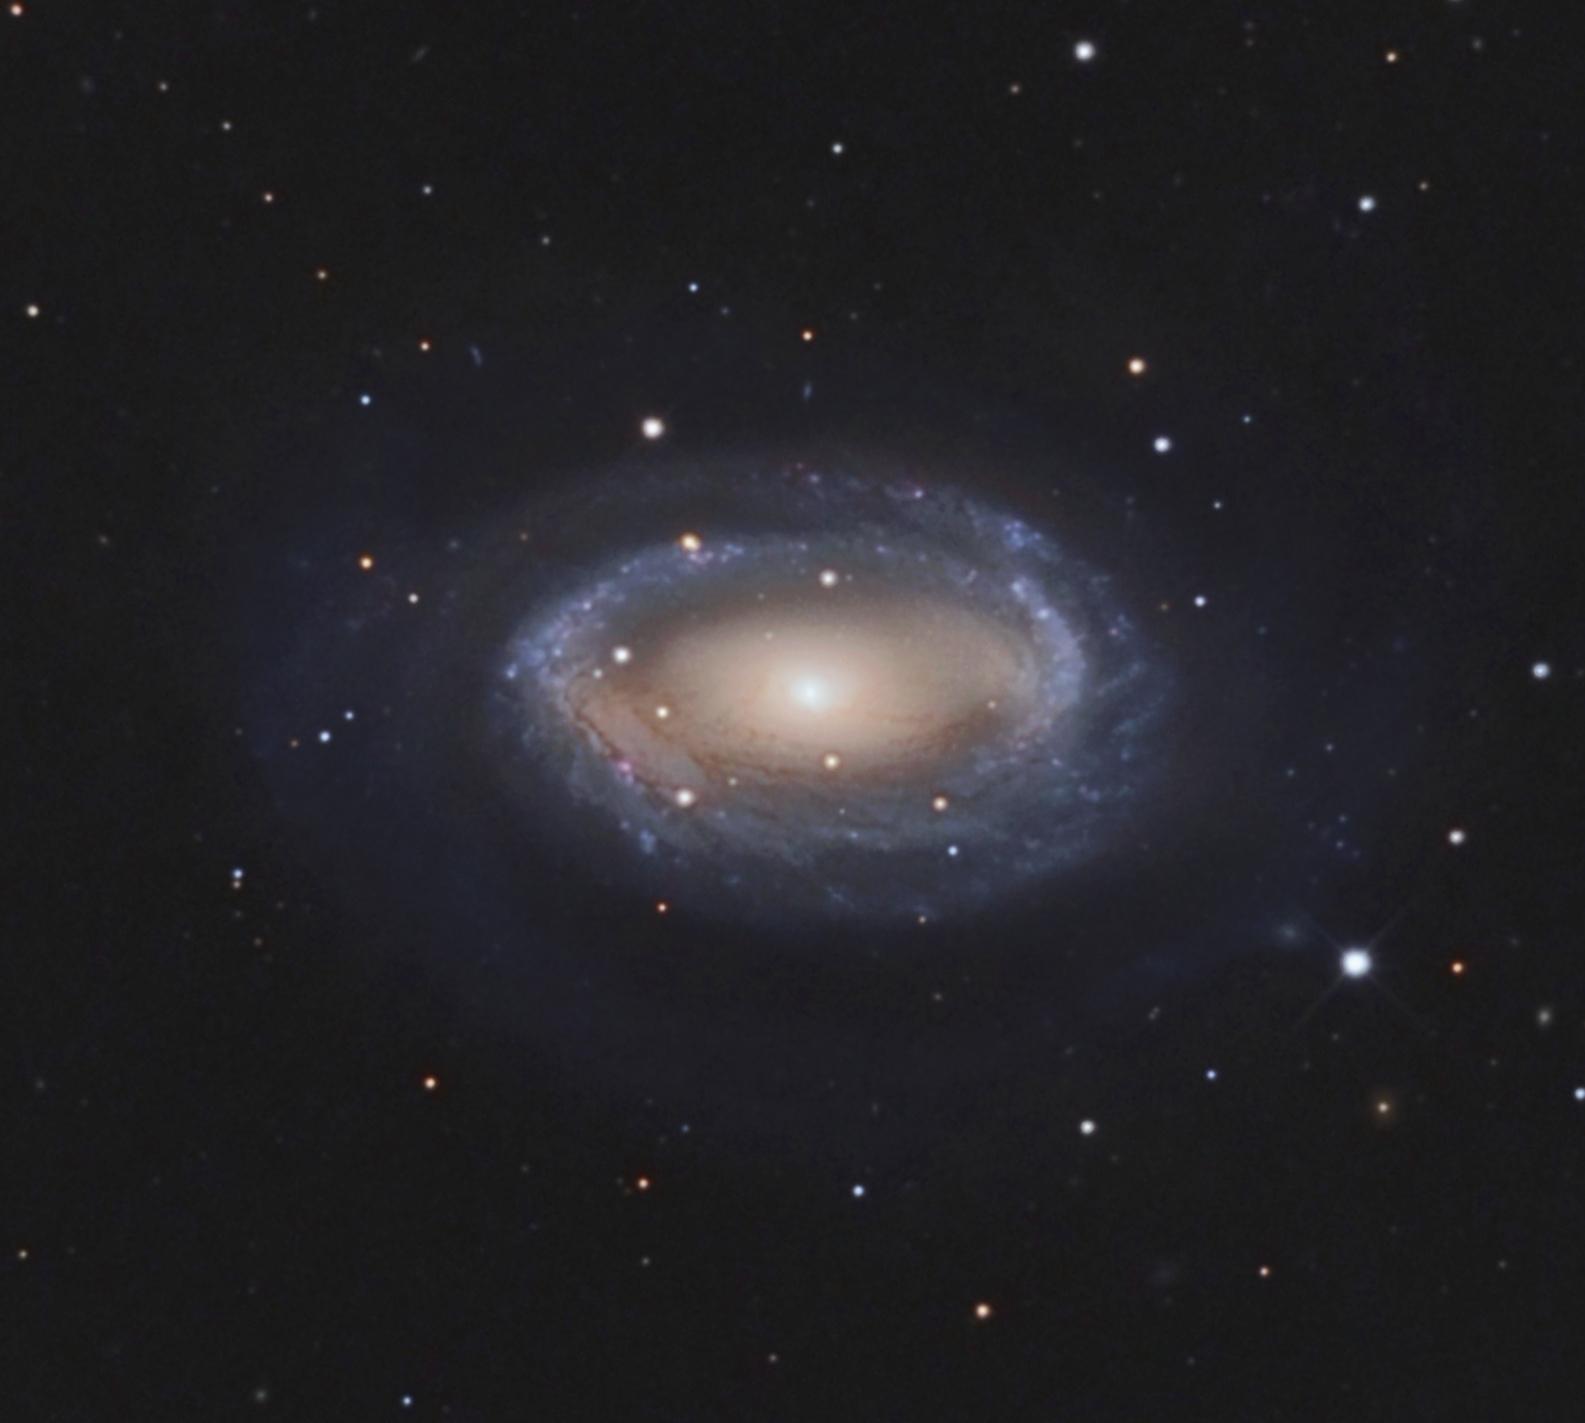 Galaxy NGC4725